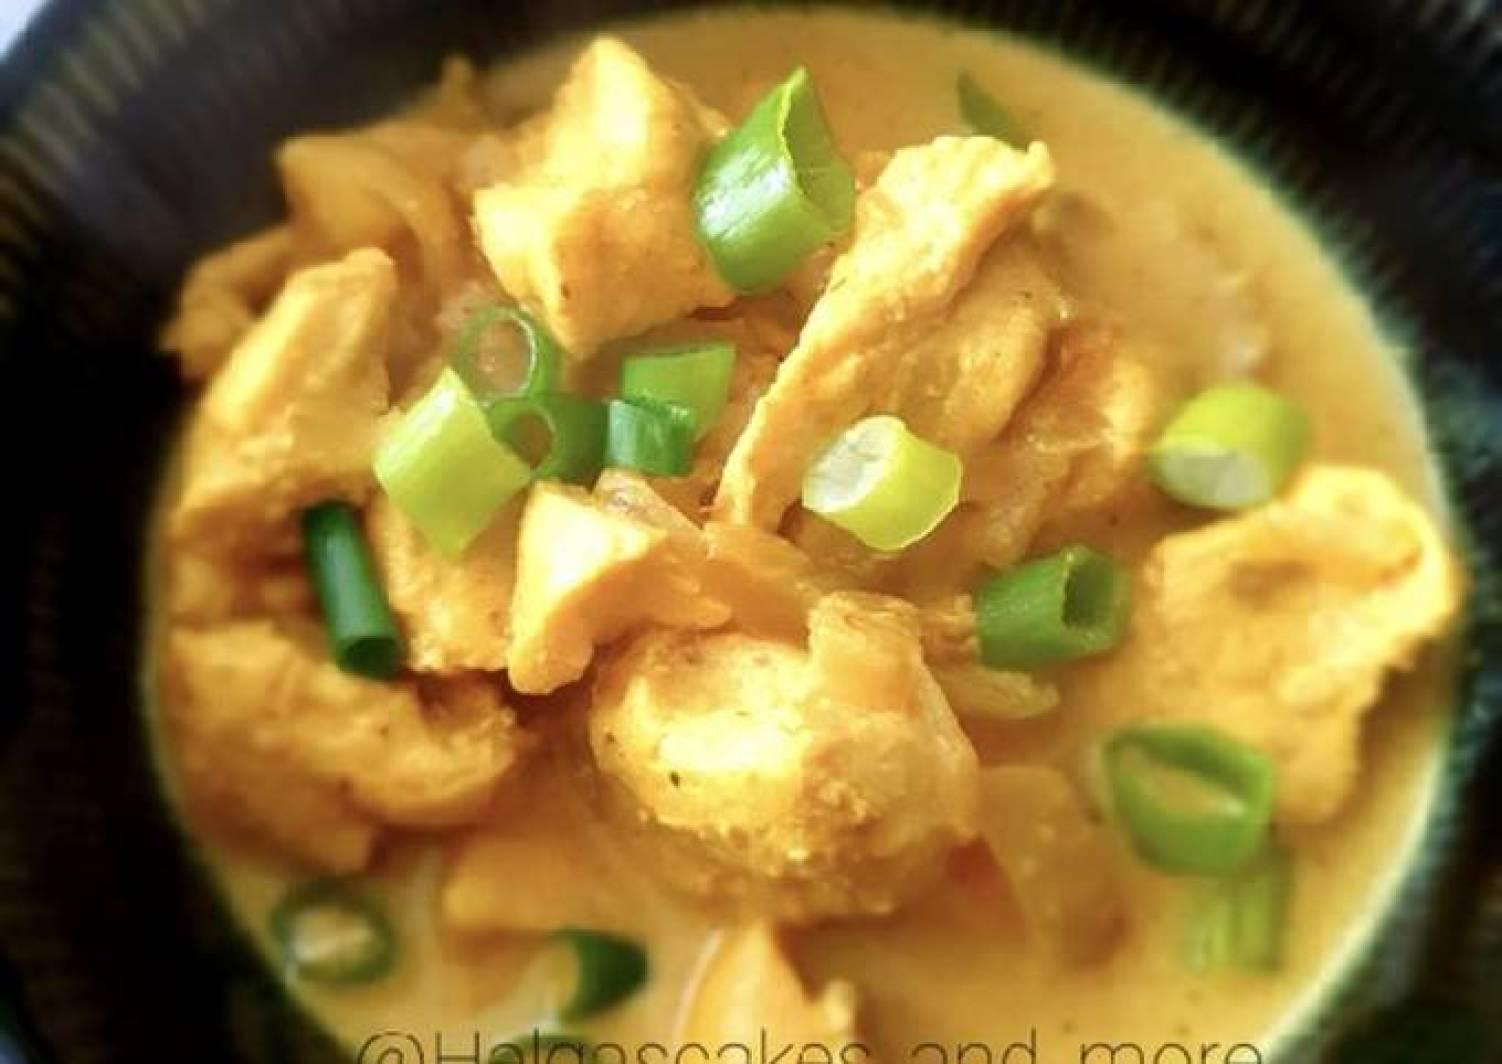 Hähnchenbrustfilets mit Curry